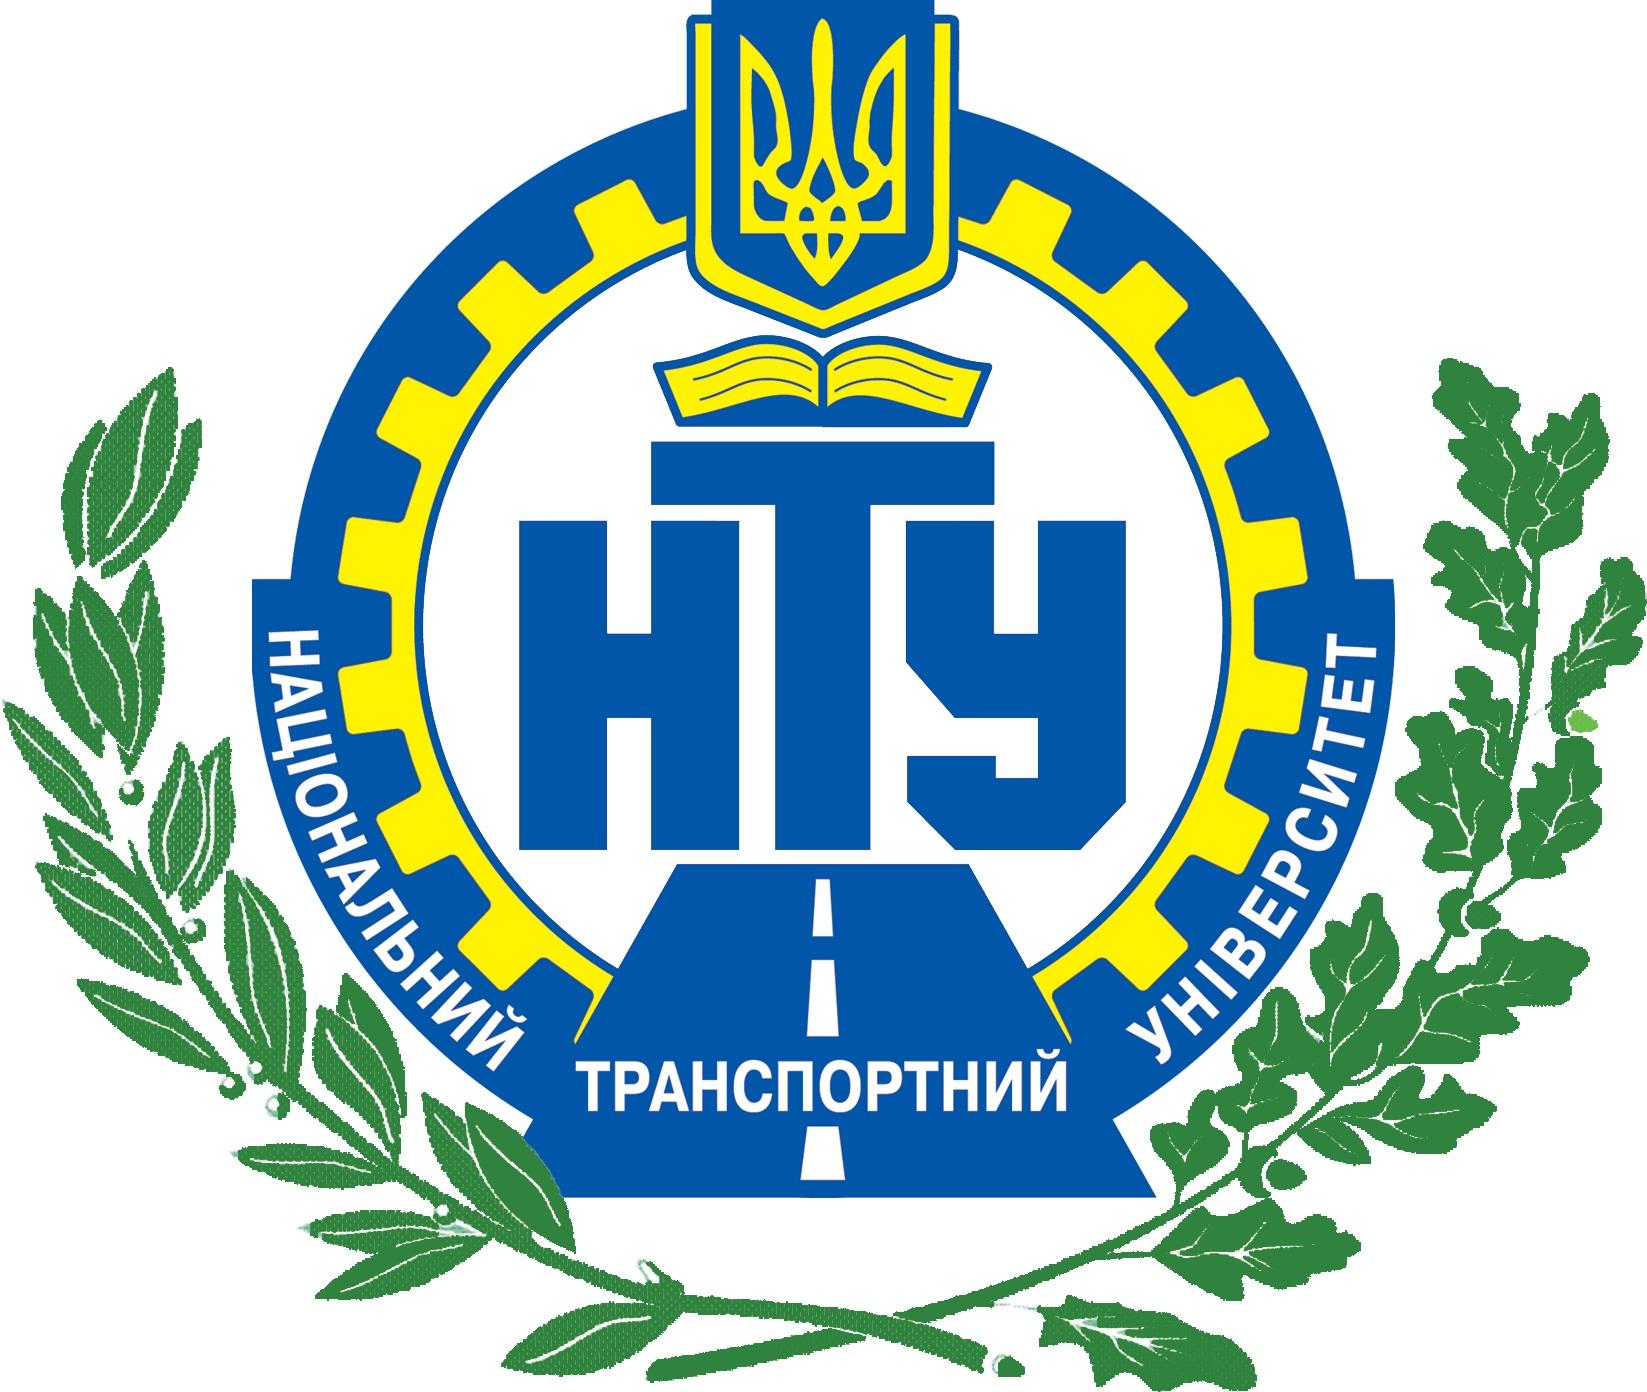 National transport university